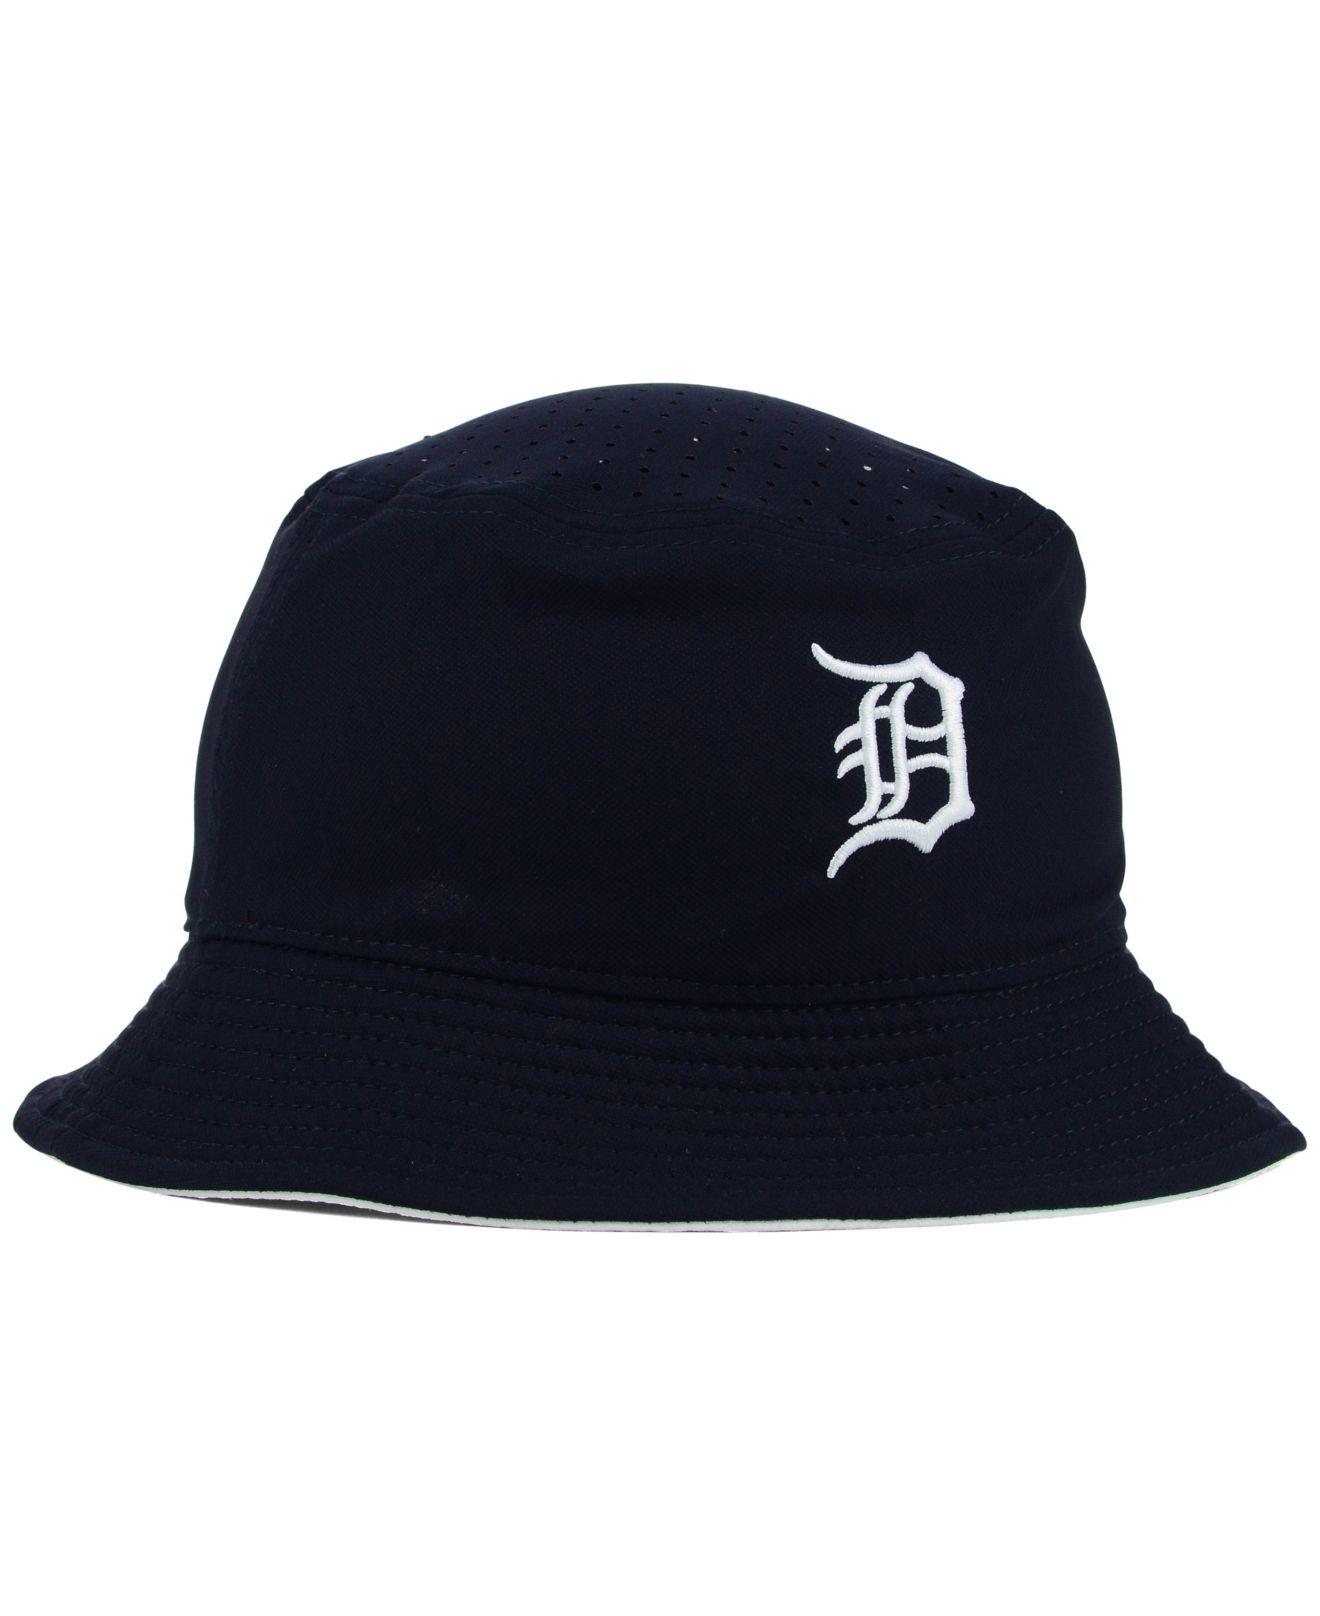 8cf58c5a183 Lyst - Nike Detroit Tigers Vapor Dri-Fit Bucket Hat in Blue for Men